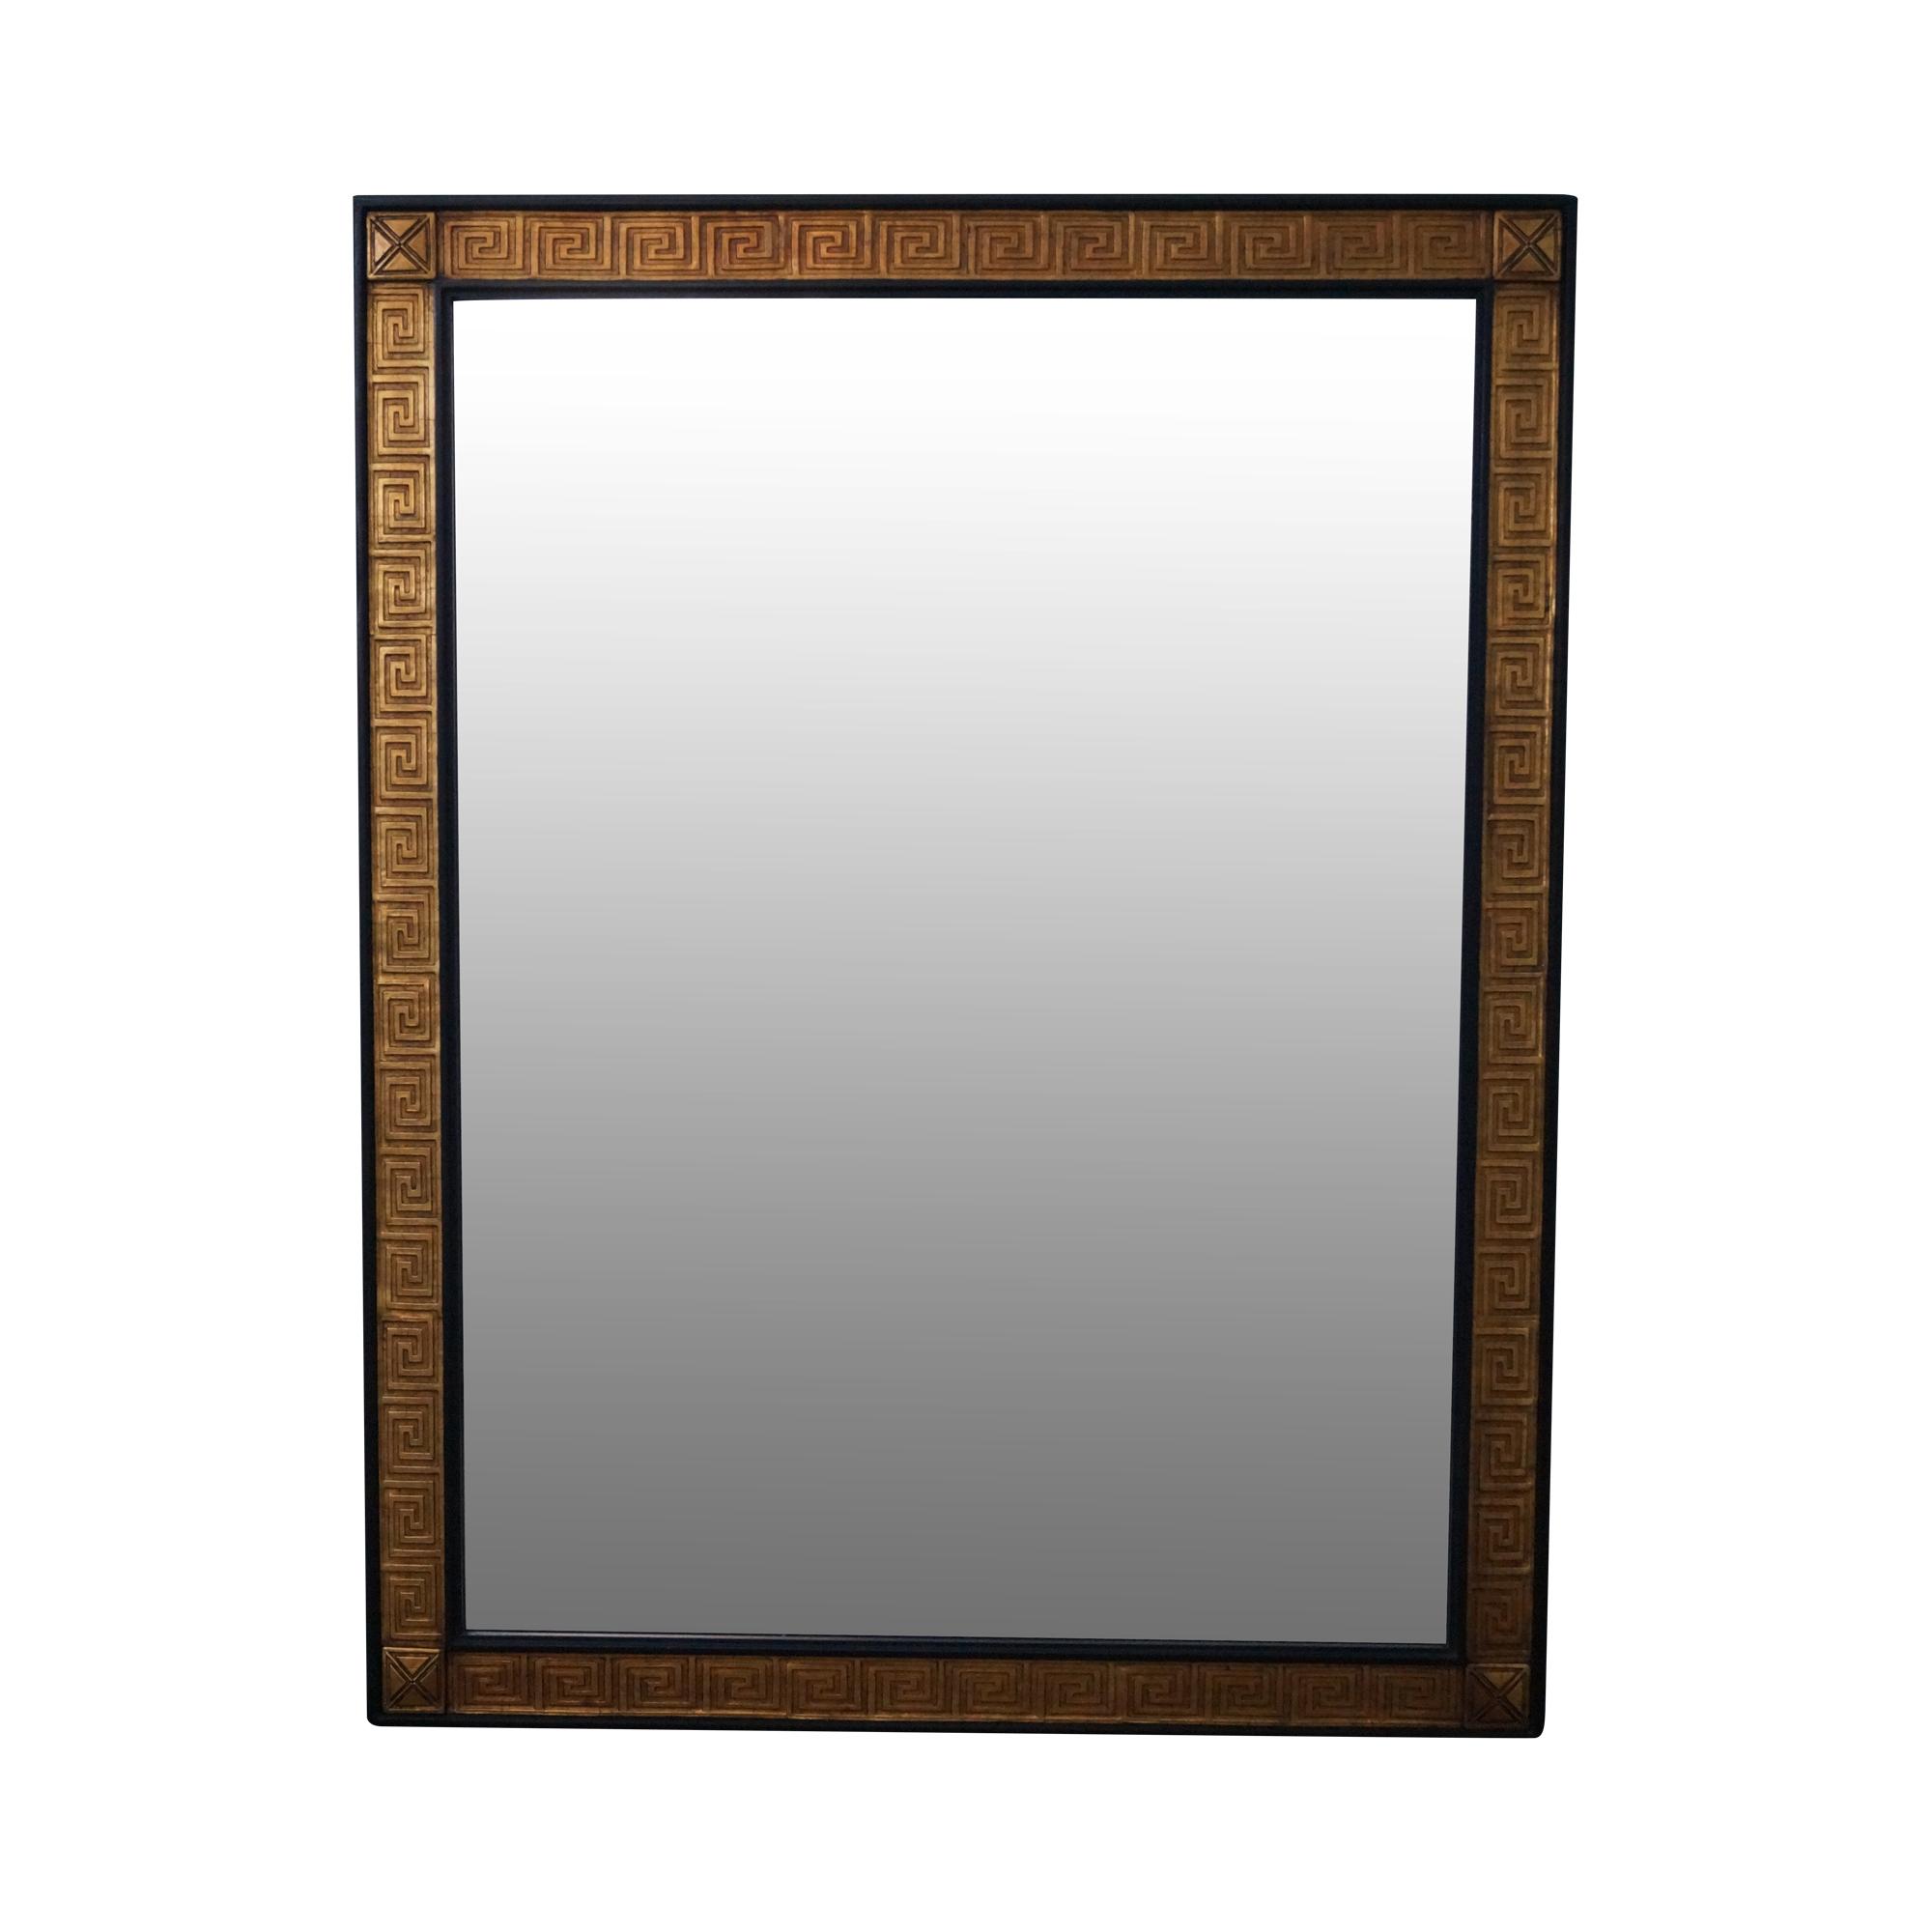 Black gold greek key design wood frame mirror chairish jeuxipadfo Choice Image